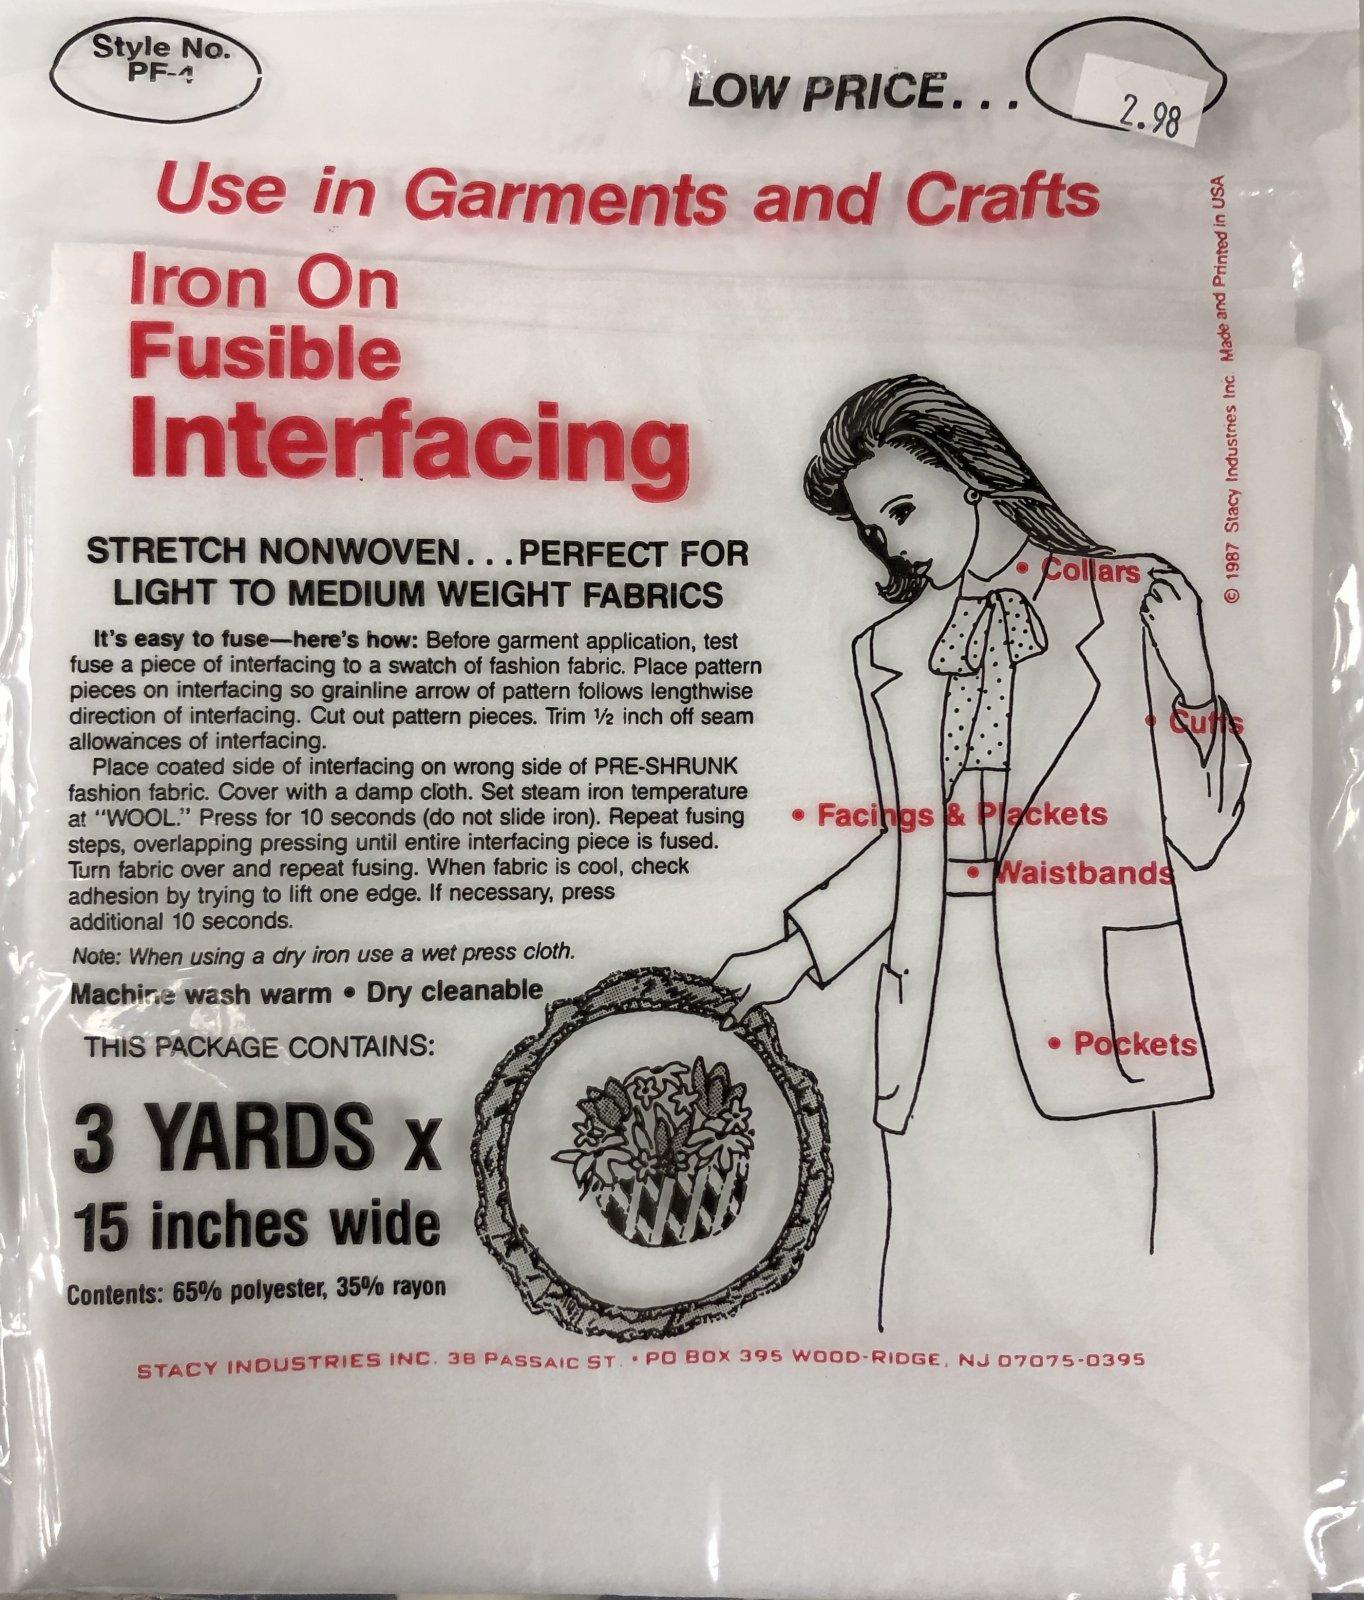 Iron on Fusible Interfacing 15 x 3 yds